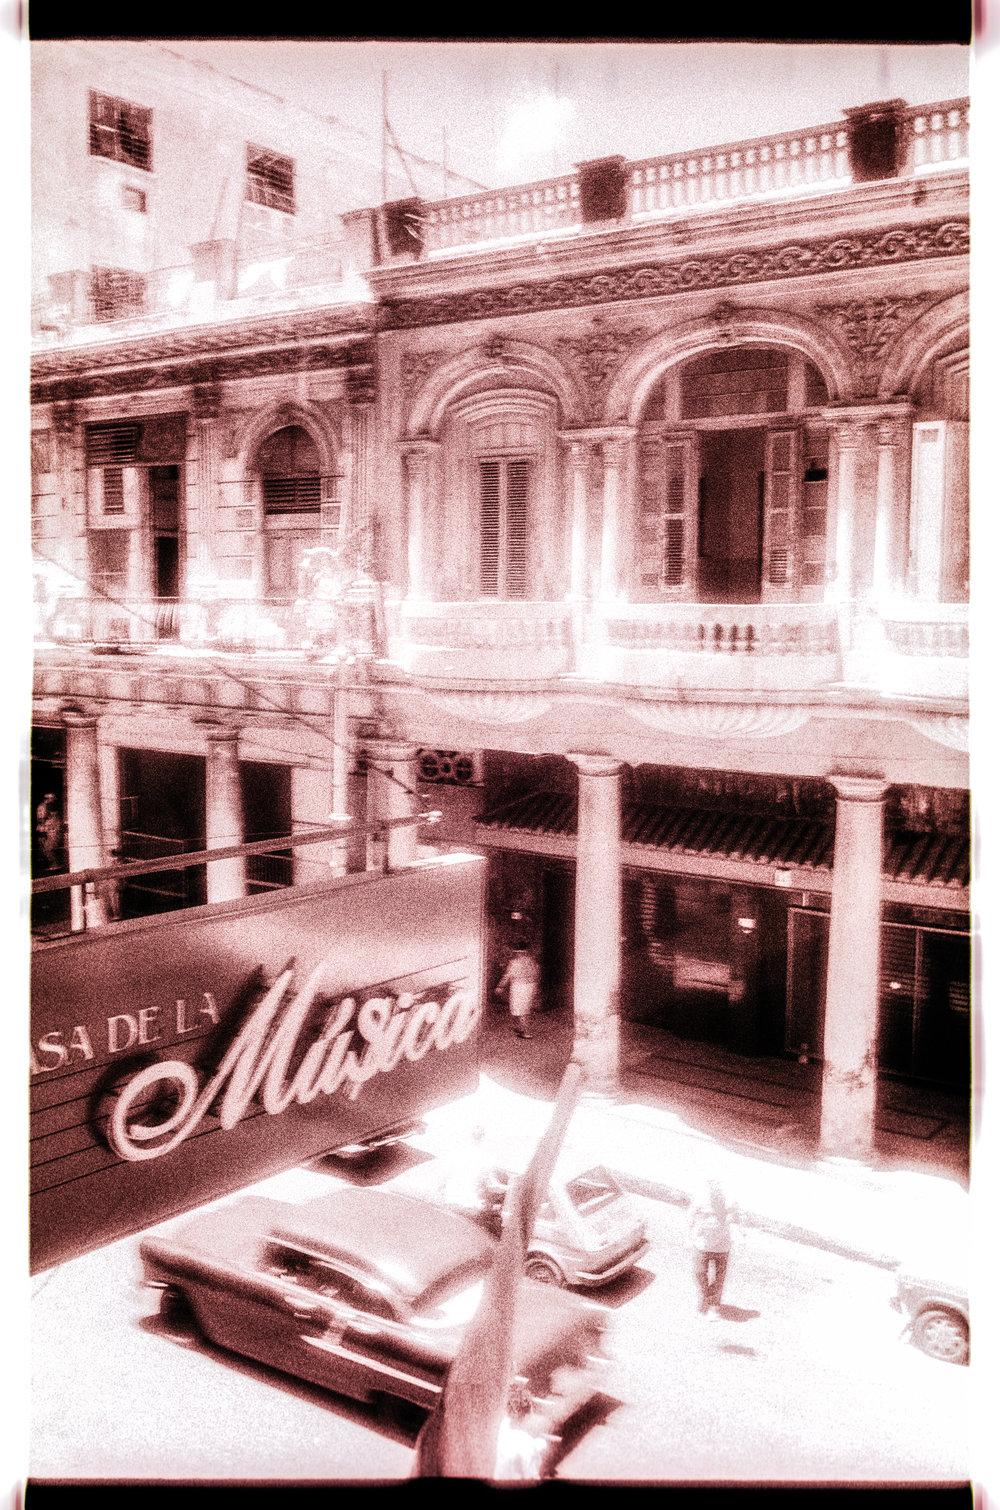 Siesta_Cuba-04.jpg